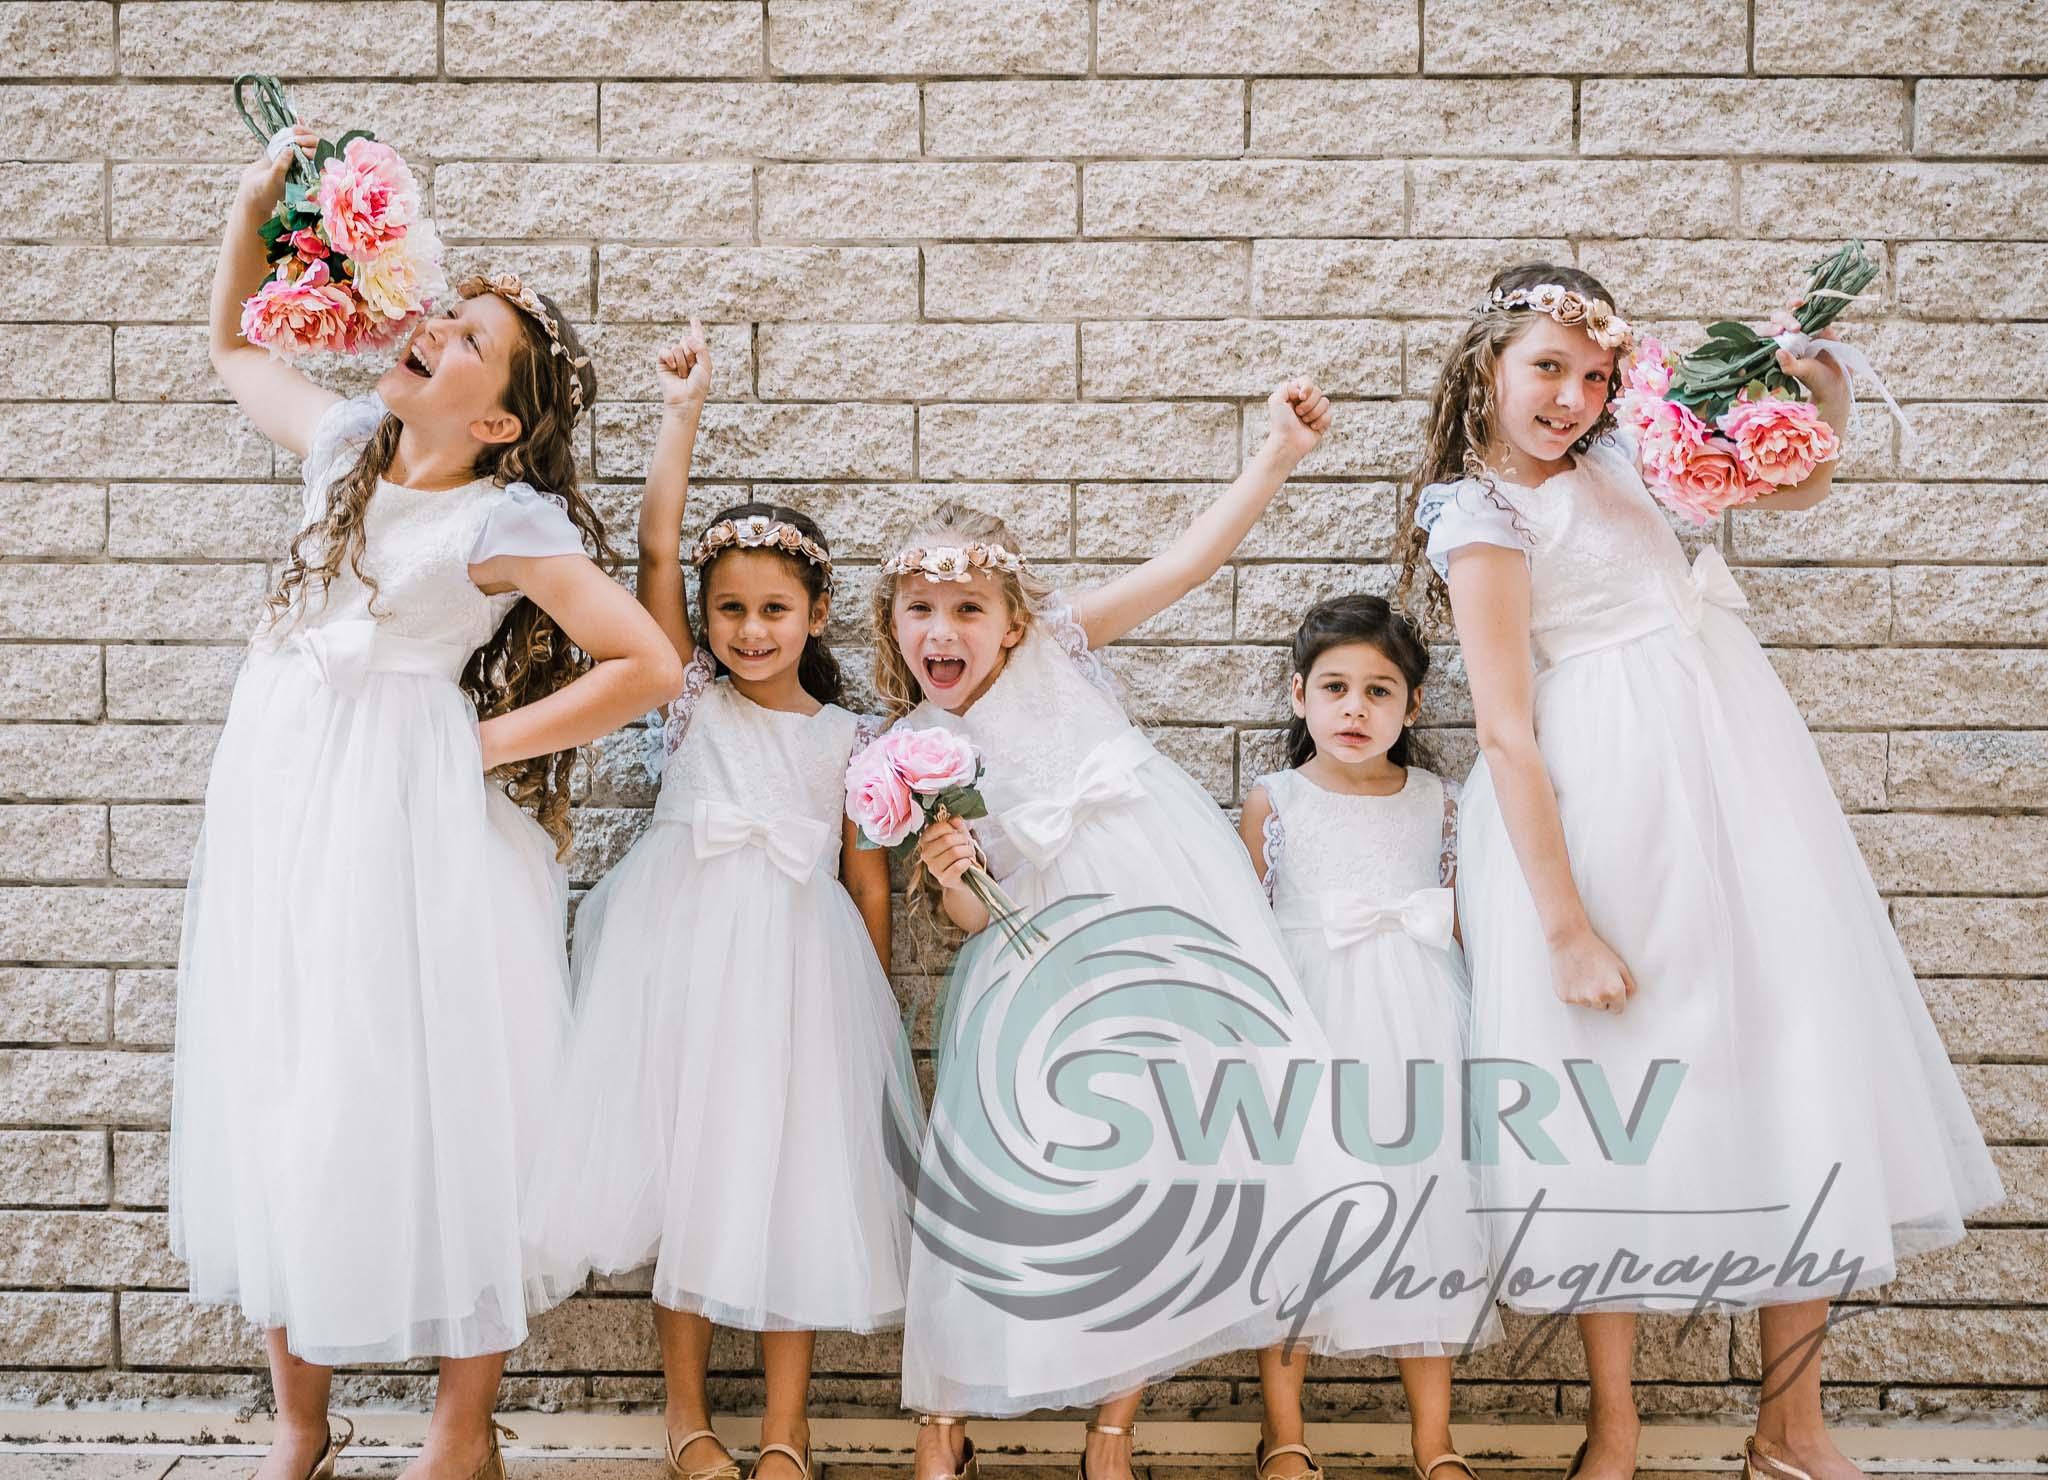 Bridesmaids by Swurv